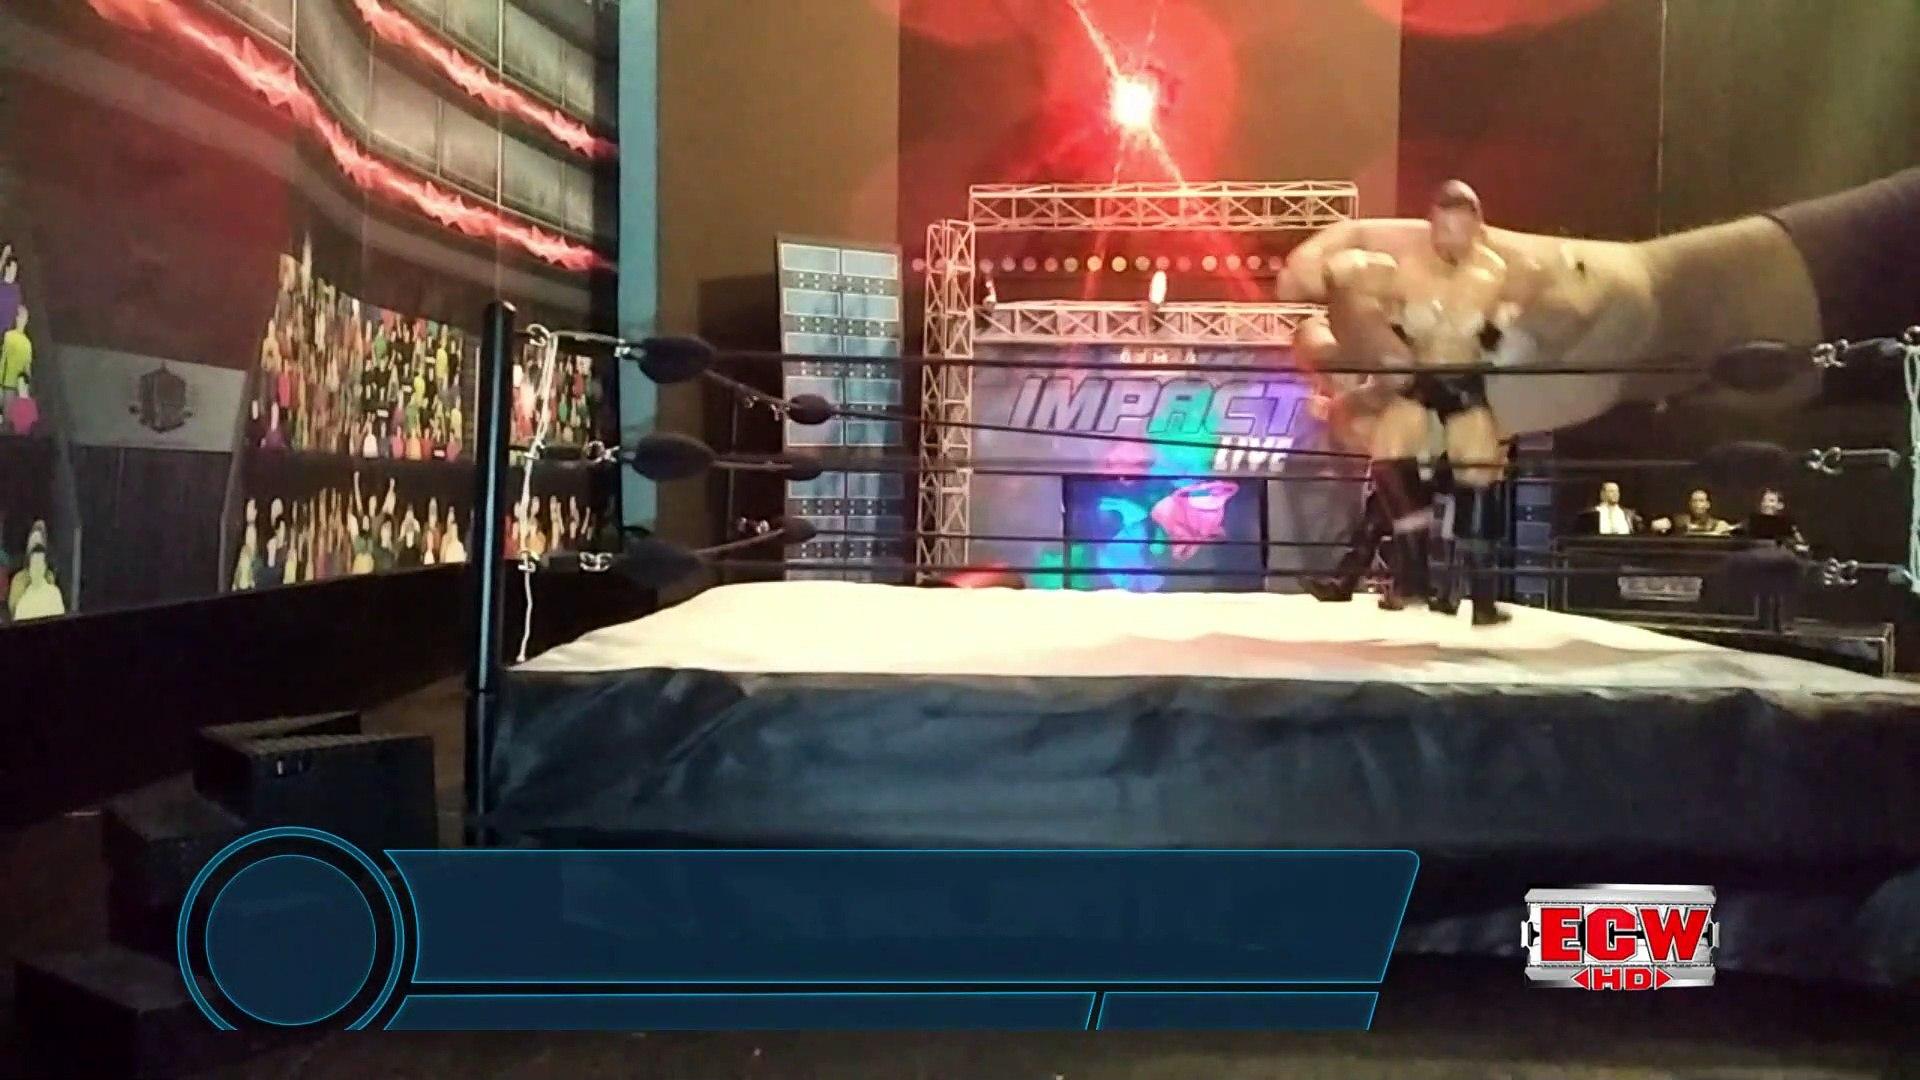 ECW Network Recap of The Week for Last Week Thursday December 13, 2018